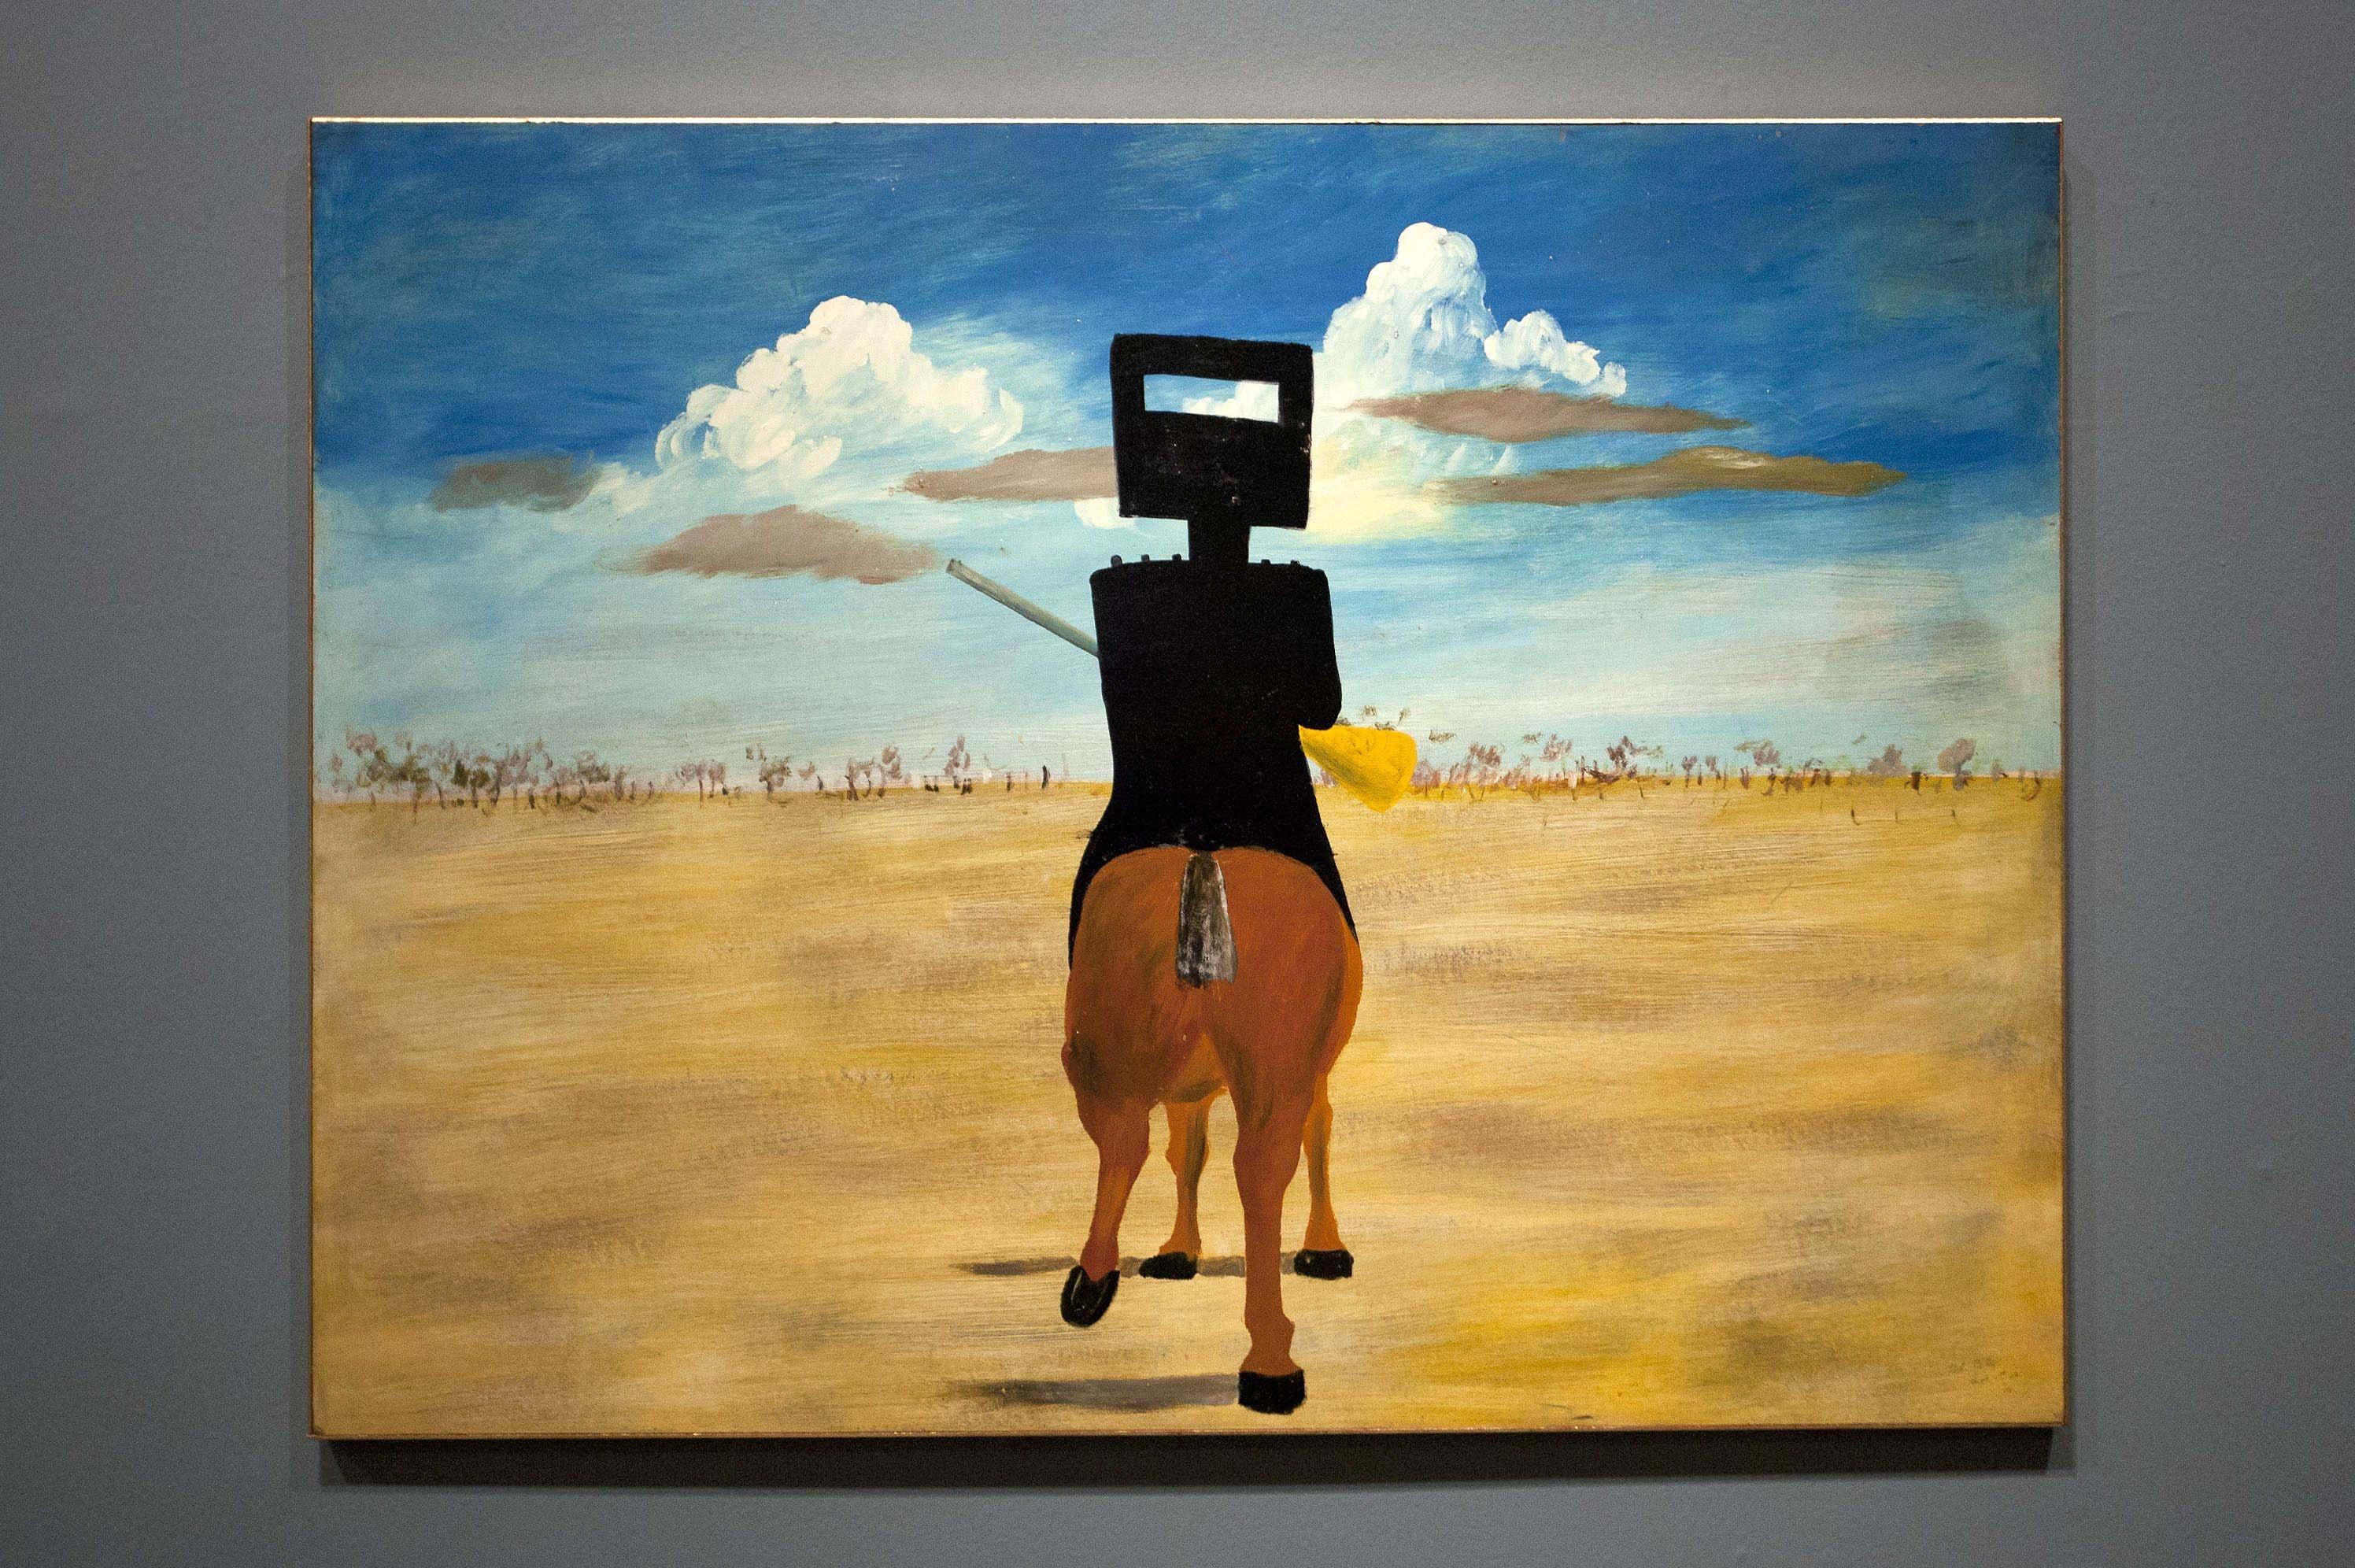 'Australia' art exhibition, Royal Academy of Arts, London, Britain - 17 Sep 2013